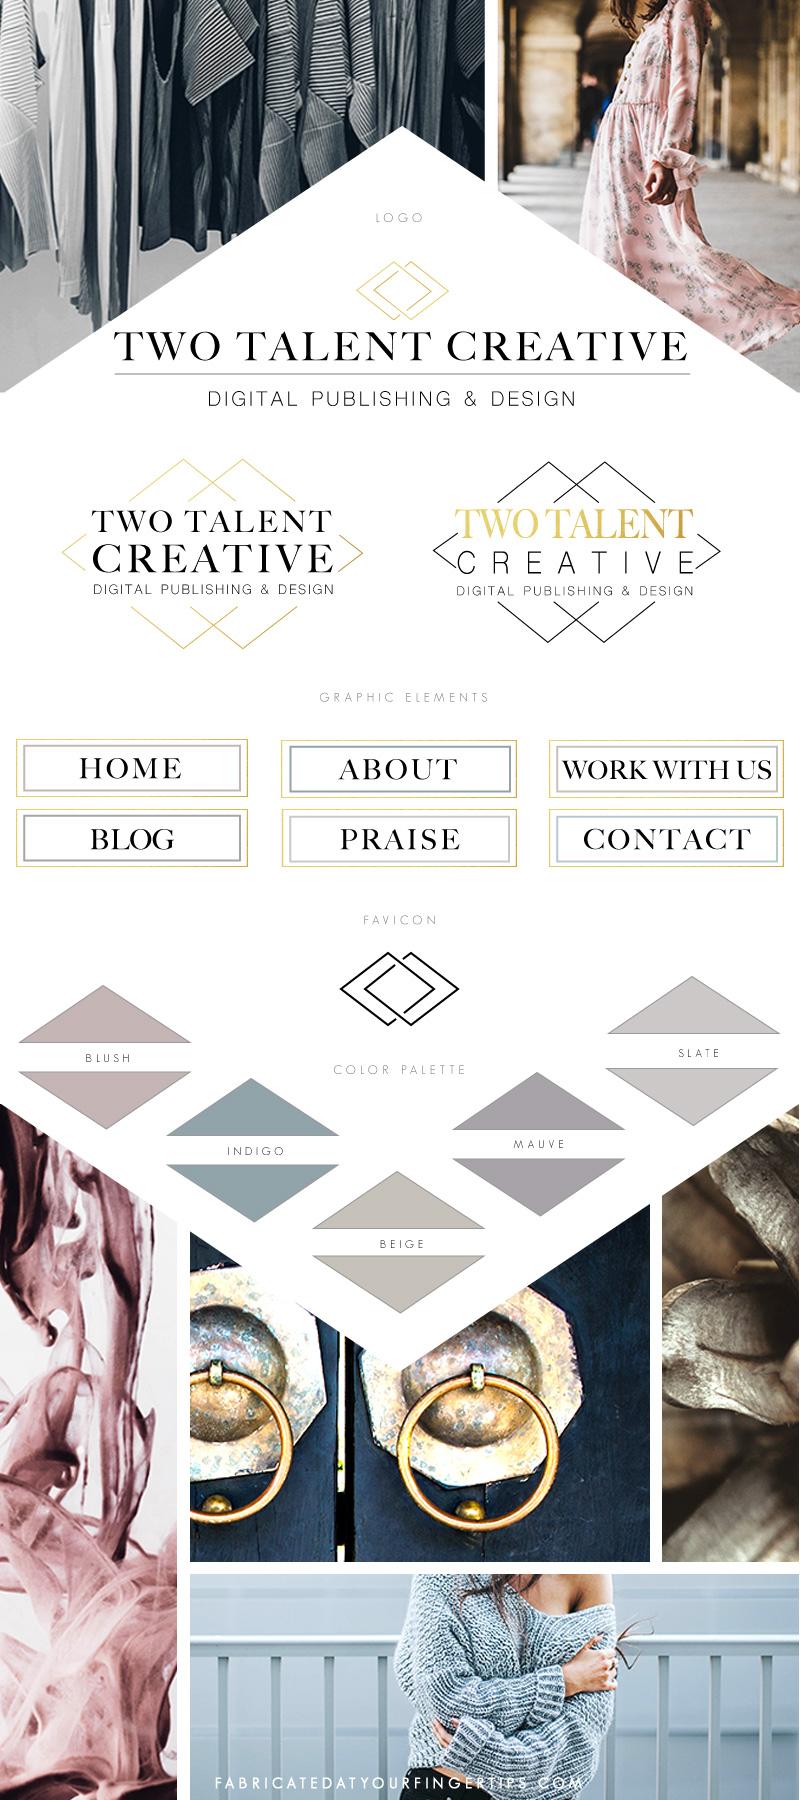 two talent creative branding style board